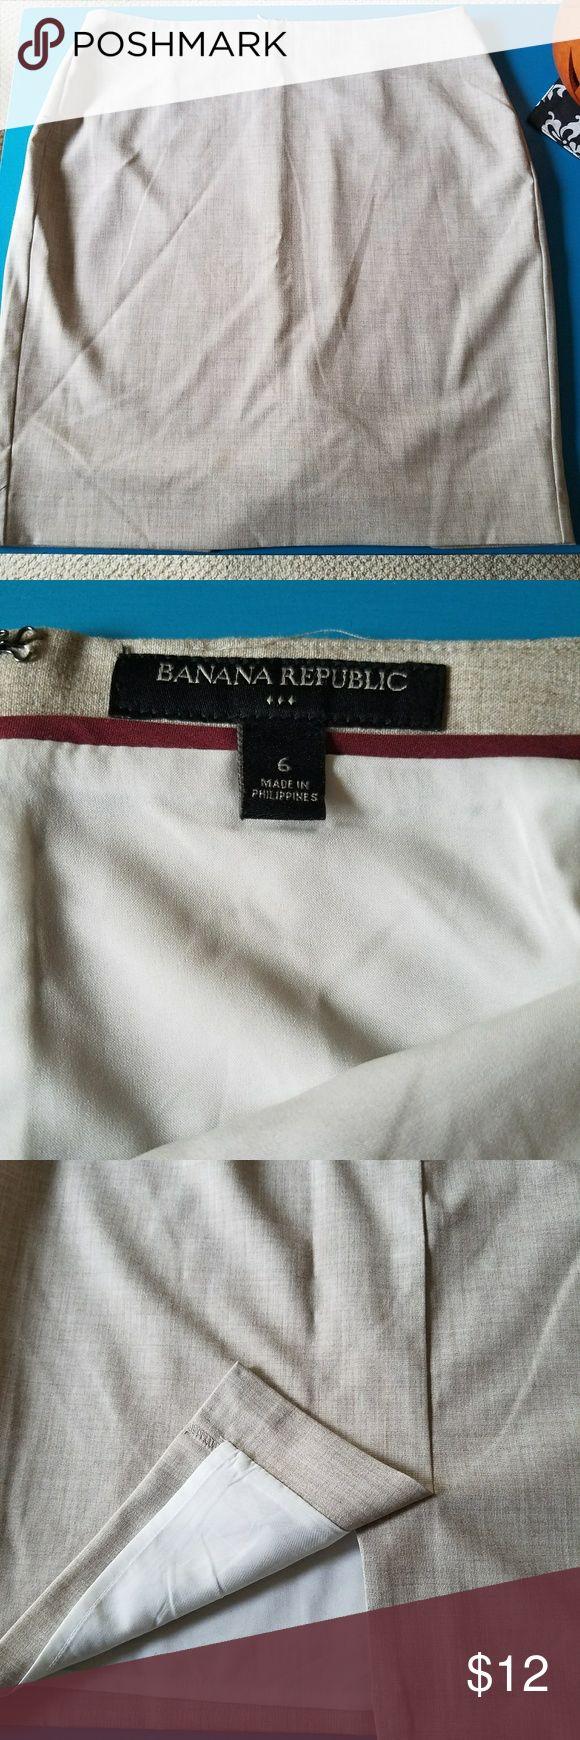 NWOT BANANA REPUBLIC CREAM SKIRT Great material with light lines. Inside slip. Banana Republic Skirts Pencil